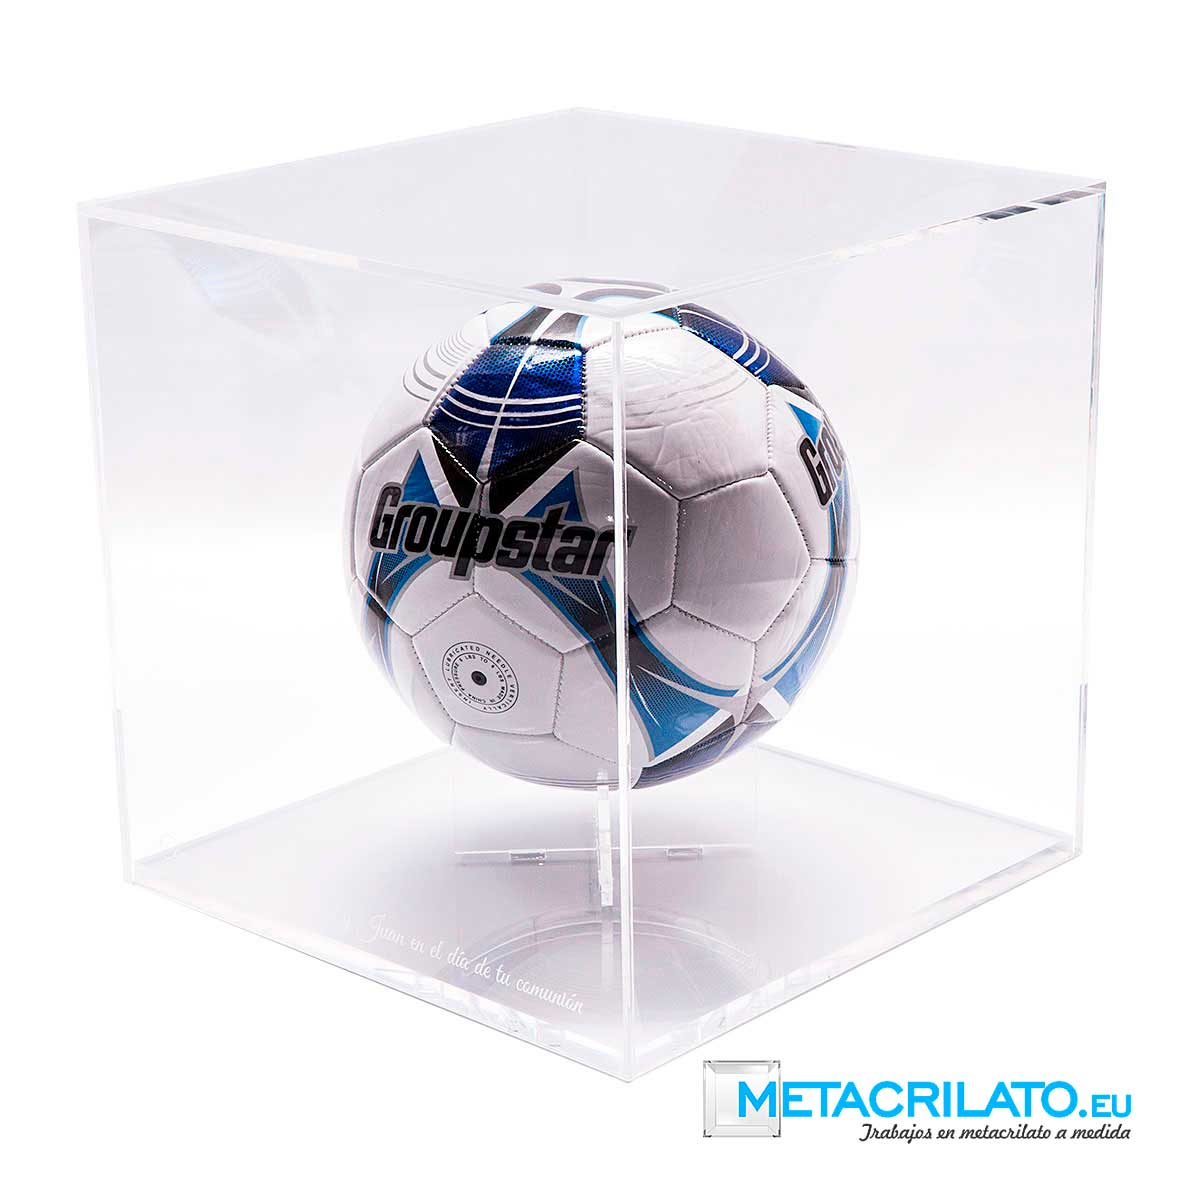 Cubo metacrilato